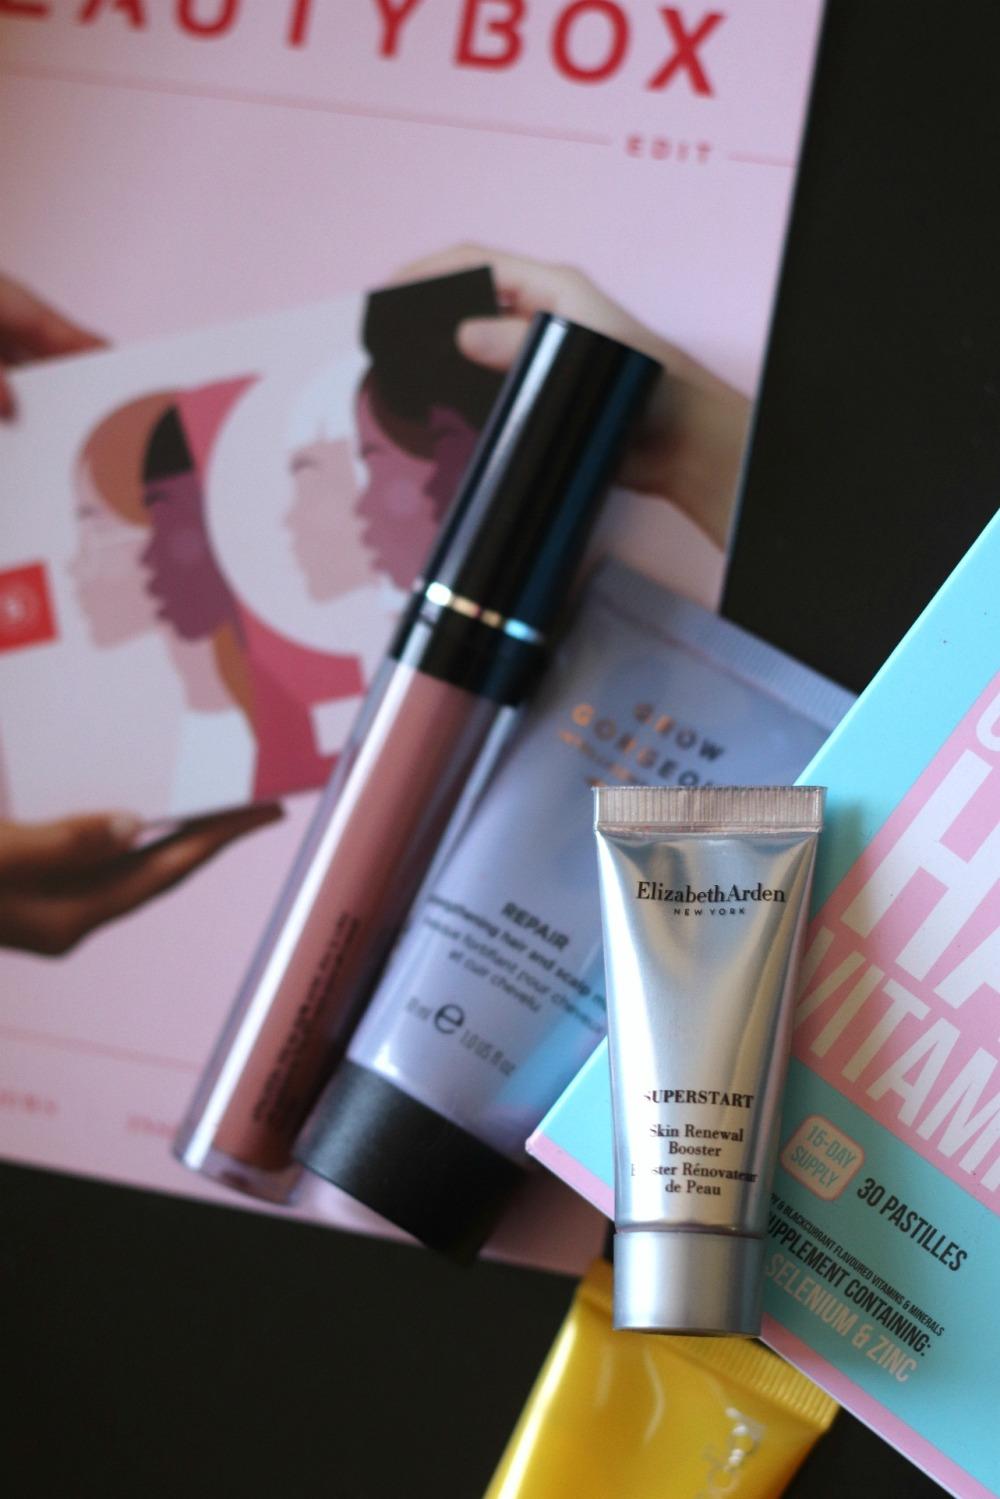 Lookfantastic March 2020 Elizabeth Arden Superstart Skin Renewal Booster